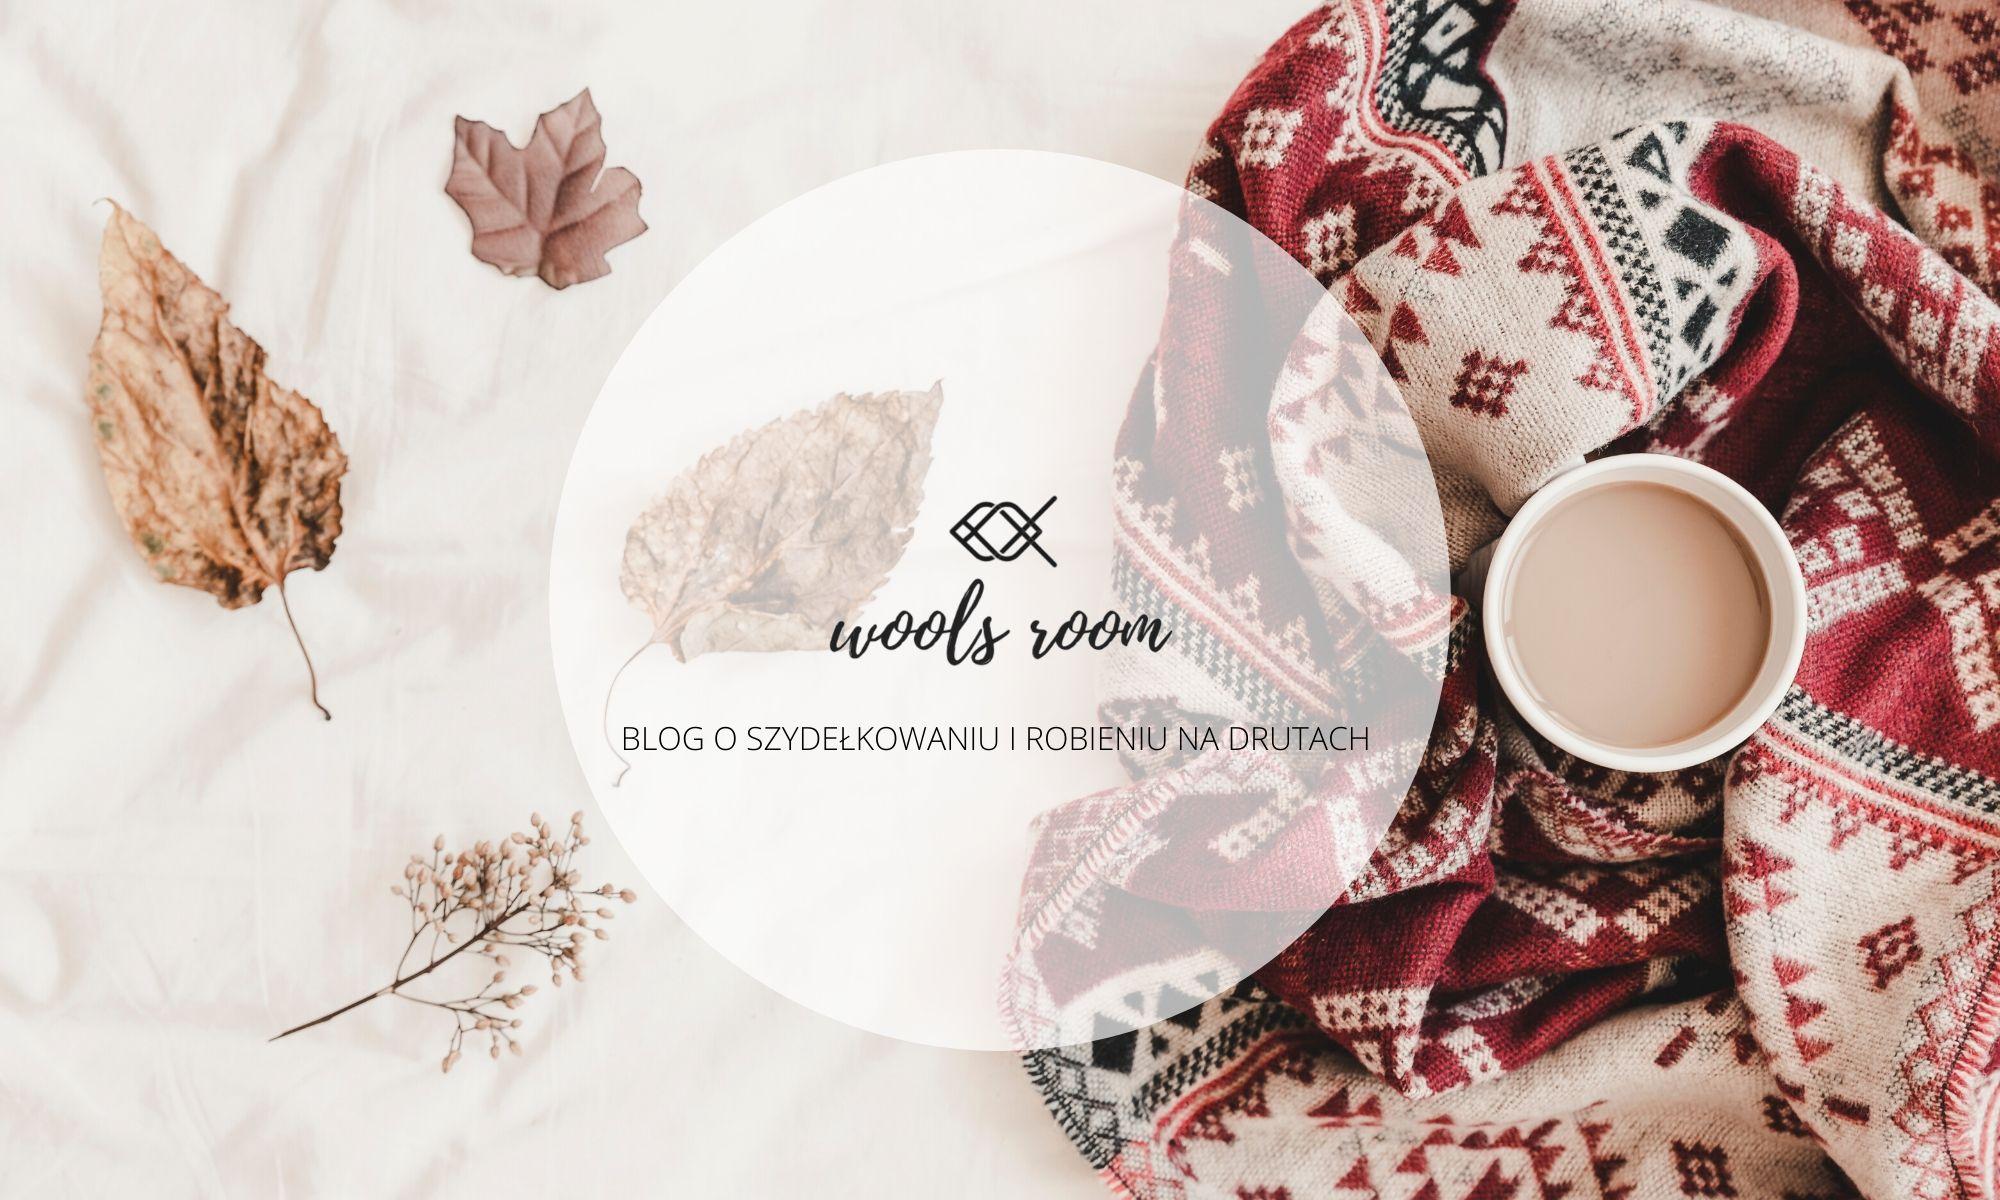 Woolsroom